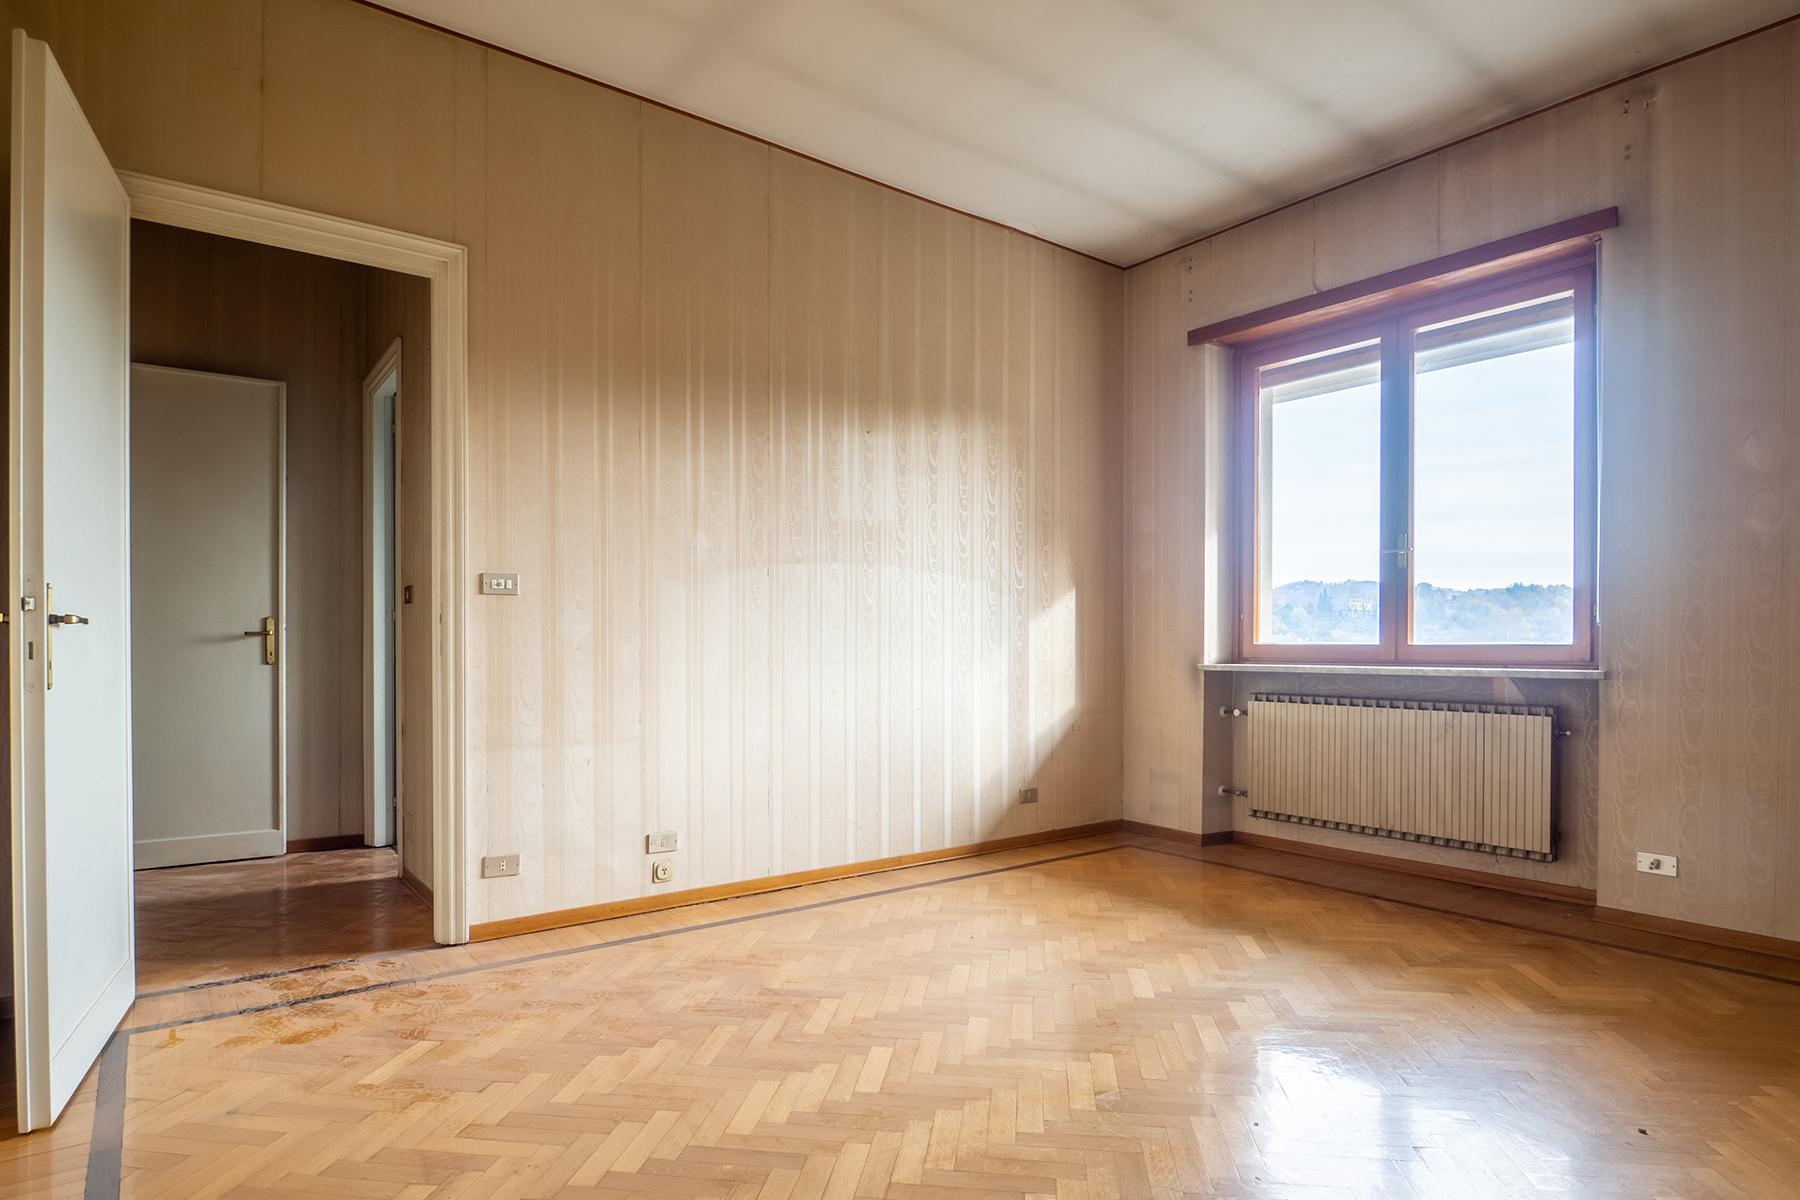 Casa indipendente in Vendita a Torino: 5 locali, 277 mq - Foto 11